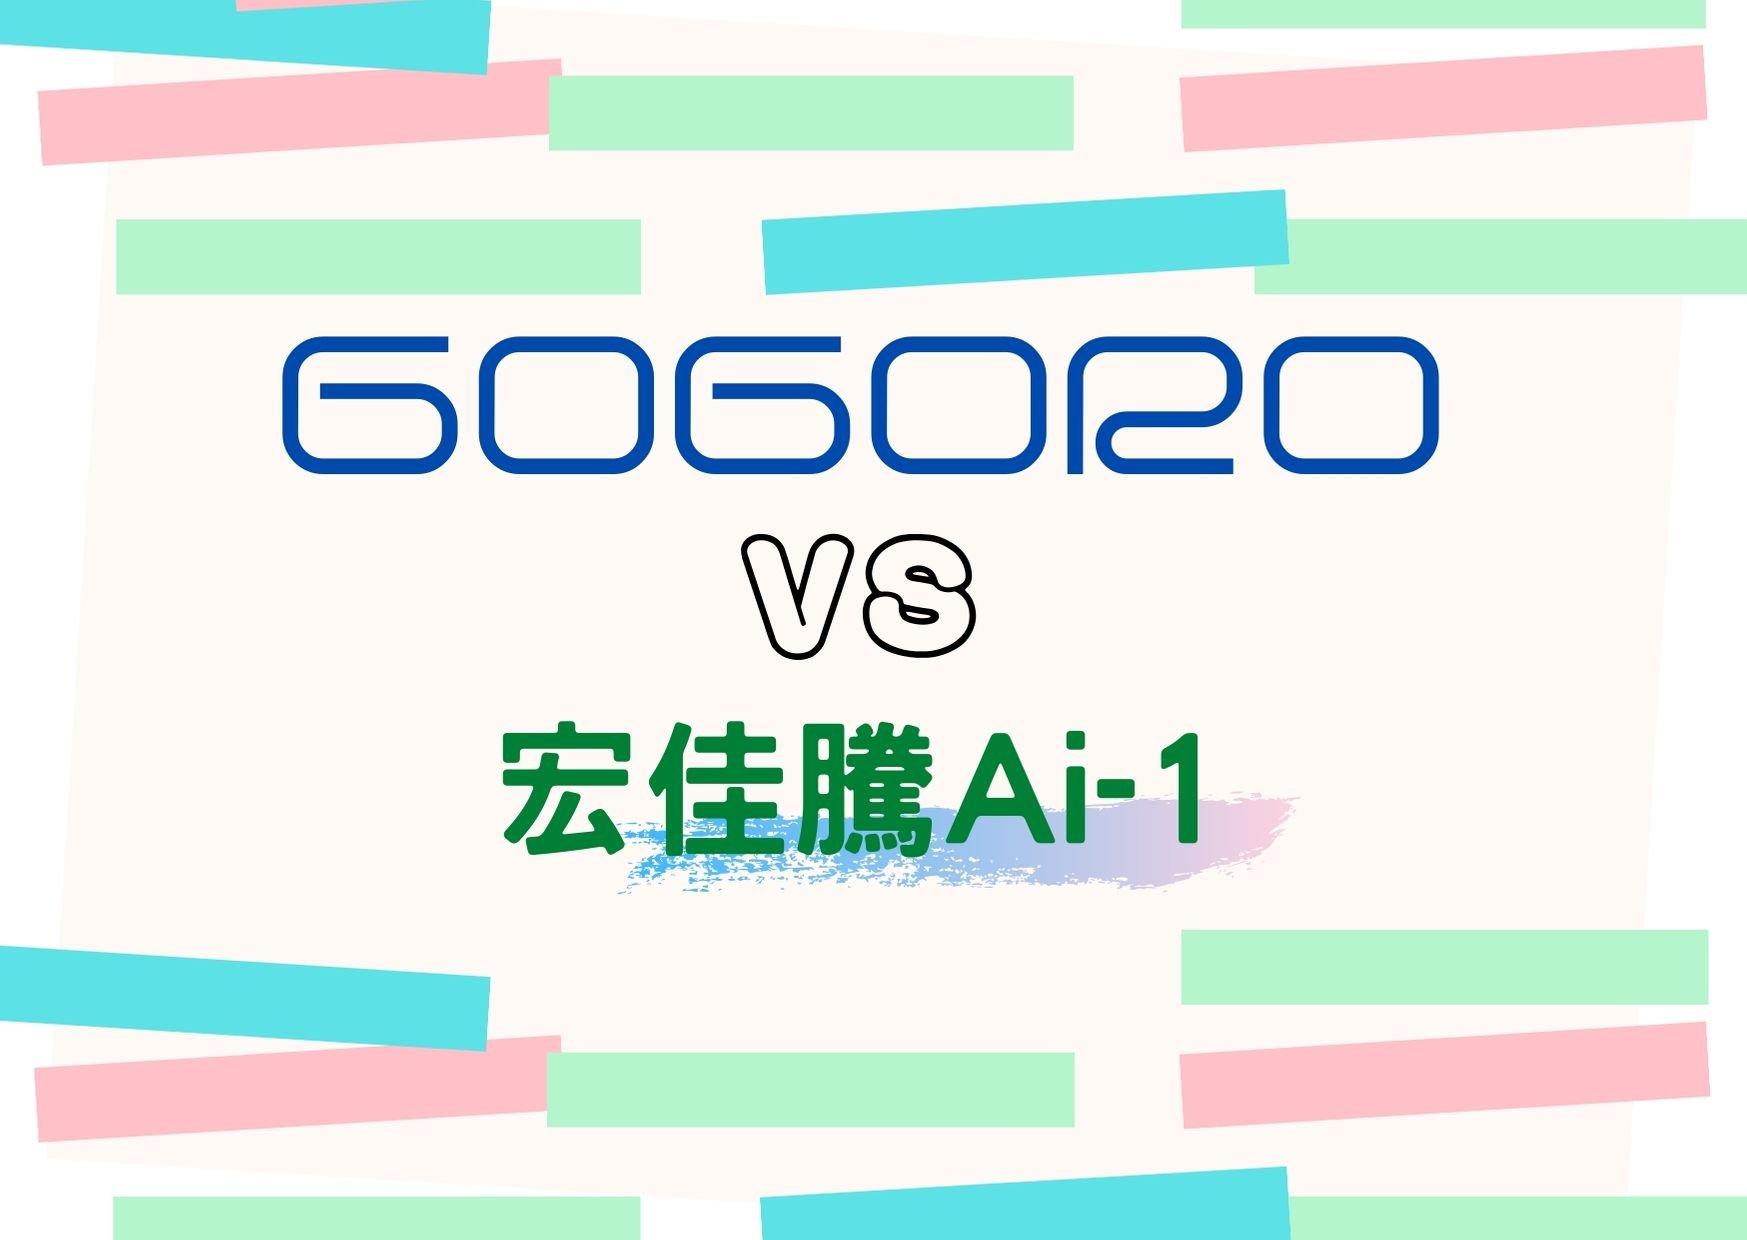 【2020Gogoro VS 宏佳騰Ai-1】電動車價格、比較、分期、優缺點評價